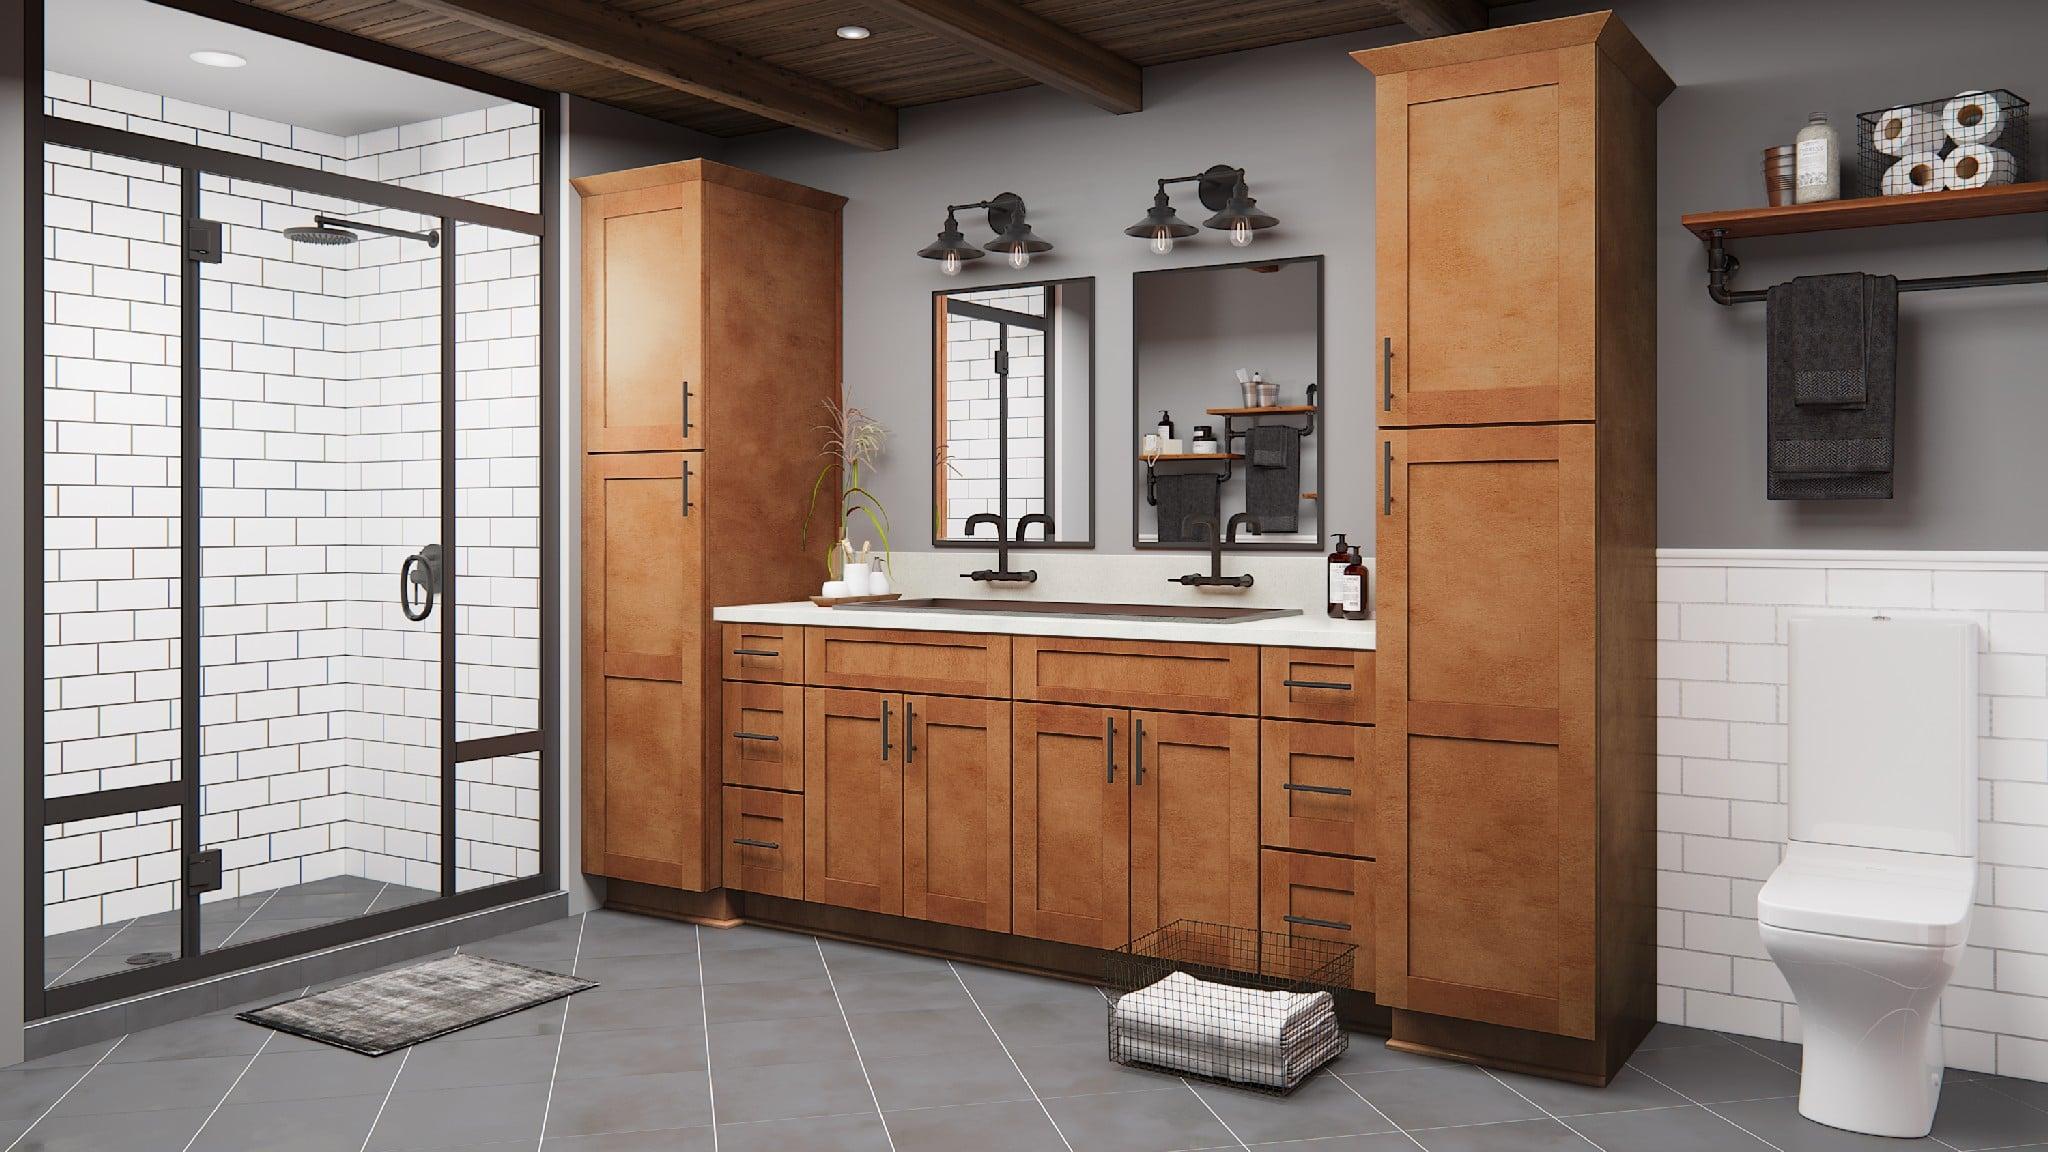 Duval County Florida Custom Cabinet Shop, Cabinet Depot & Cabinet Design | STA Cabinet Depot